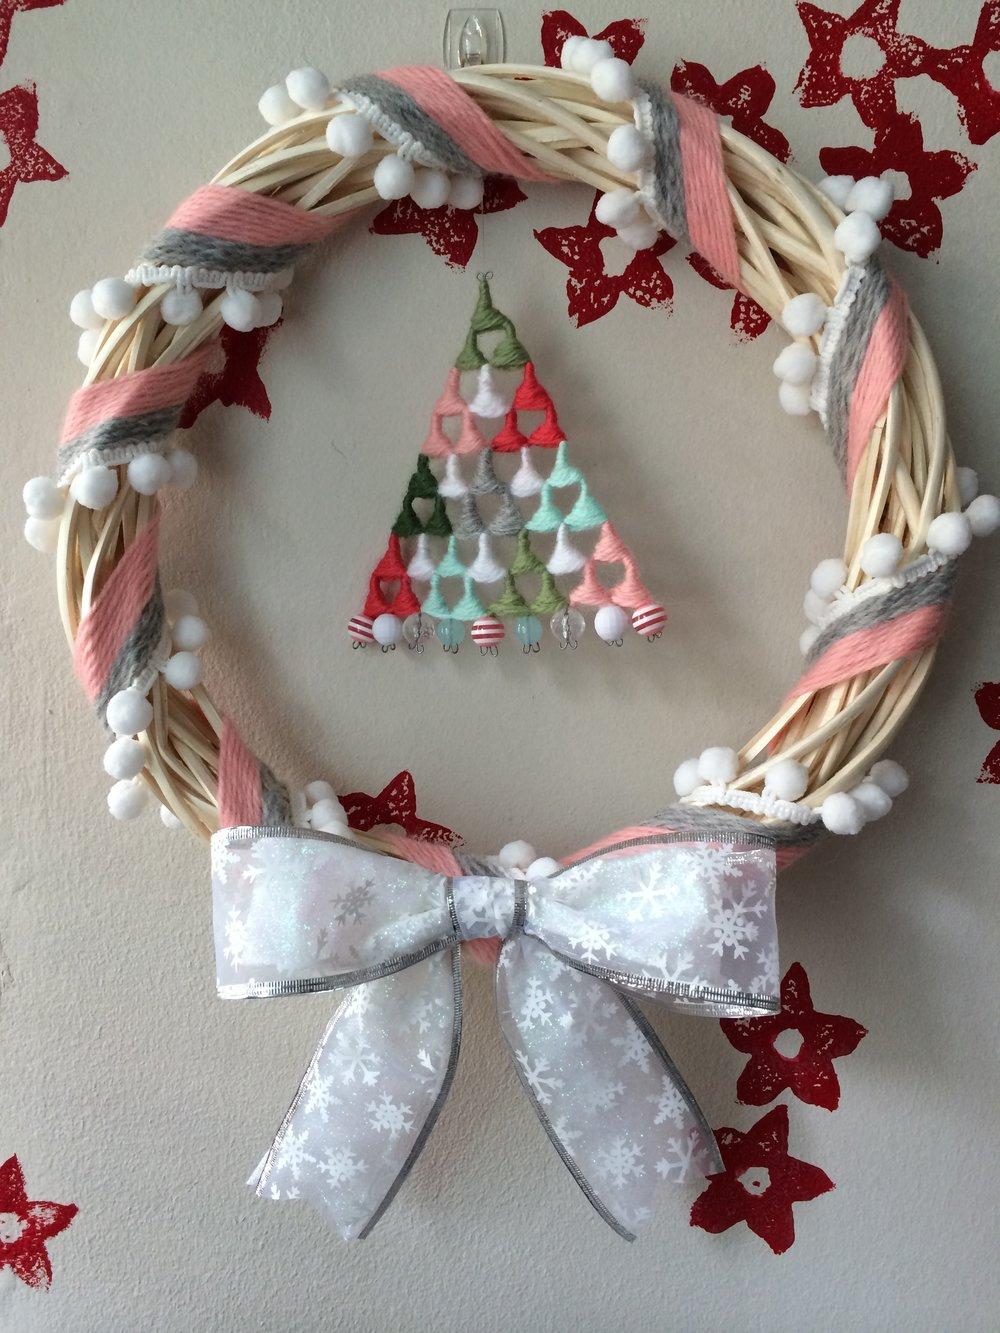 Christmas Wreath_Strawberry Shortcake_01.jpg